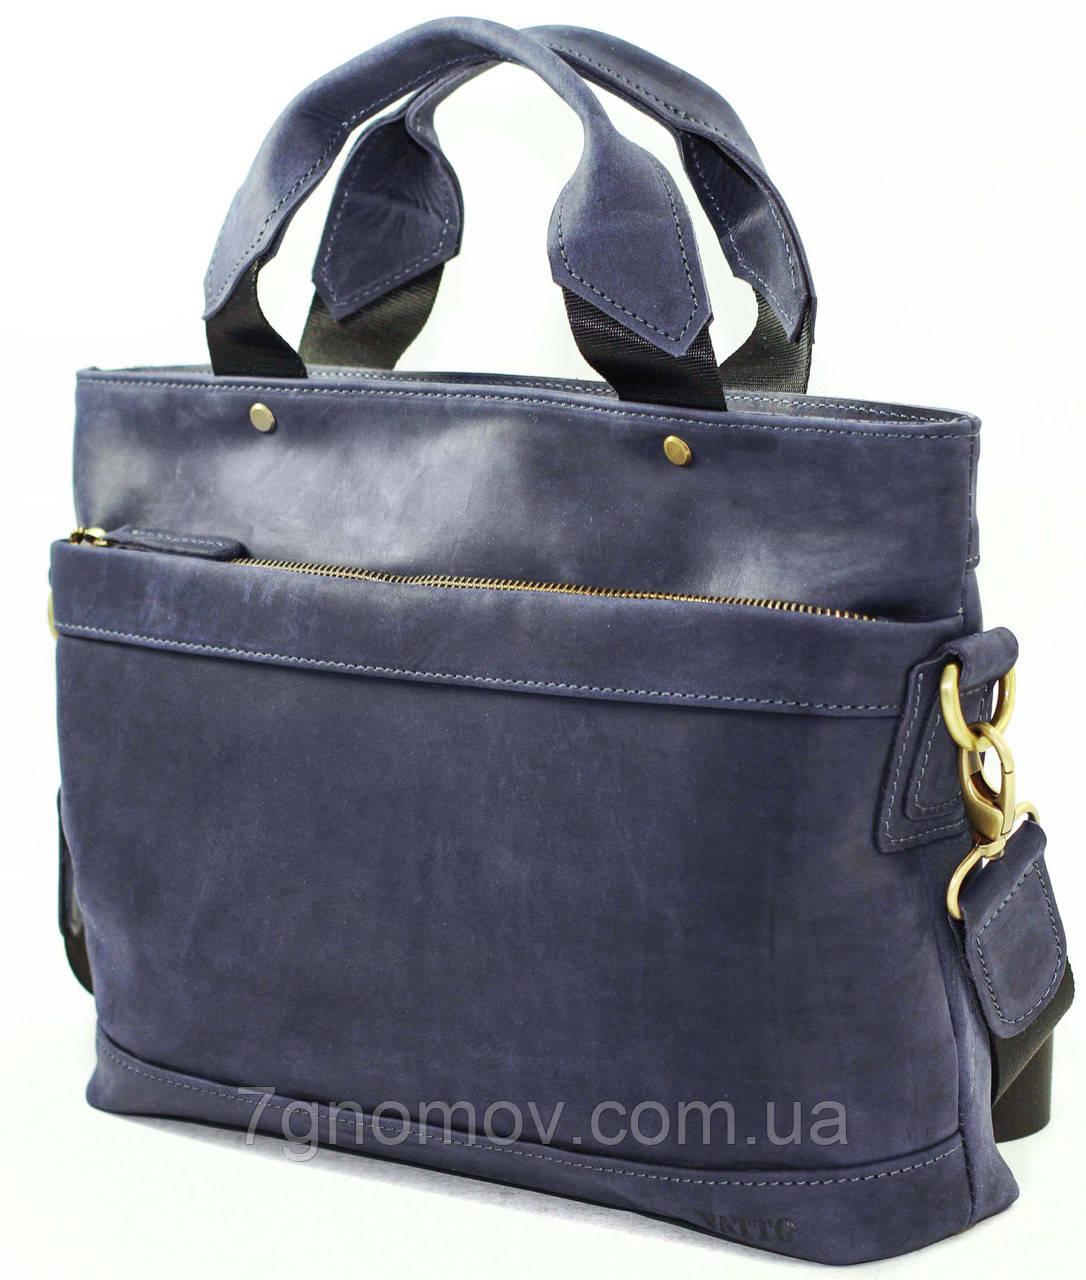 Чоловіча сумка VATTO Mk13.2 Kr600